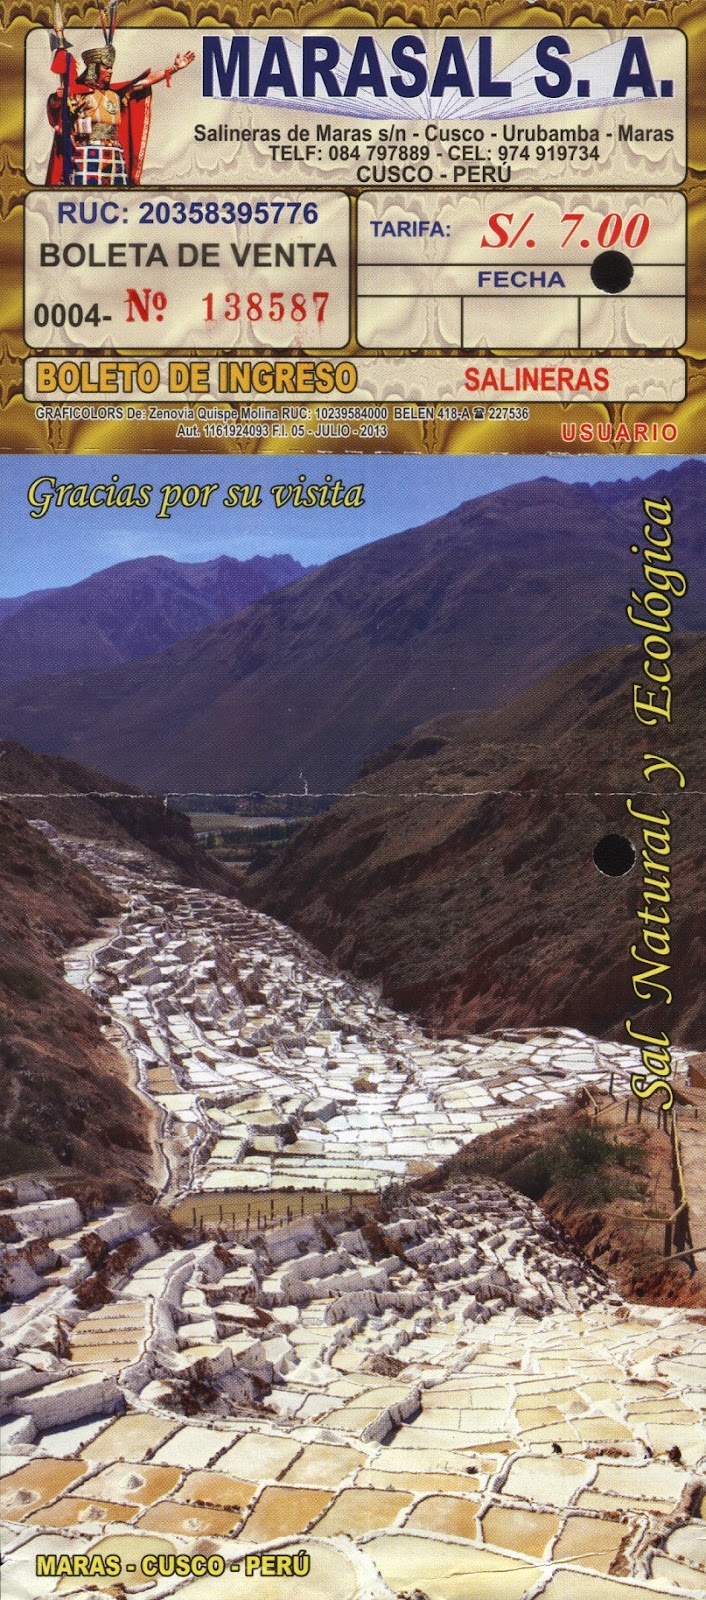 Boleto de visita para as Salineras de Maras / Peru.